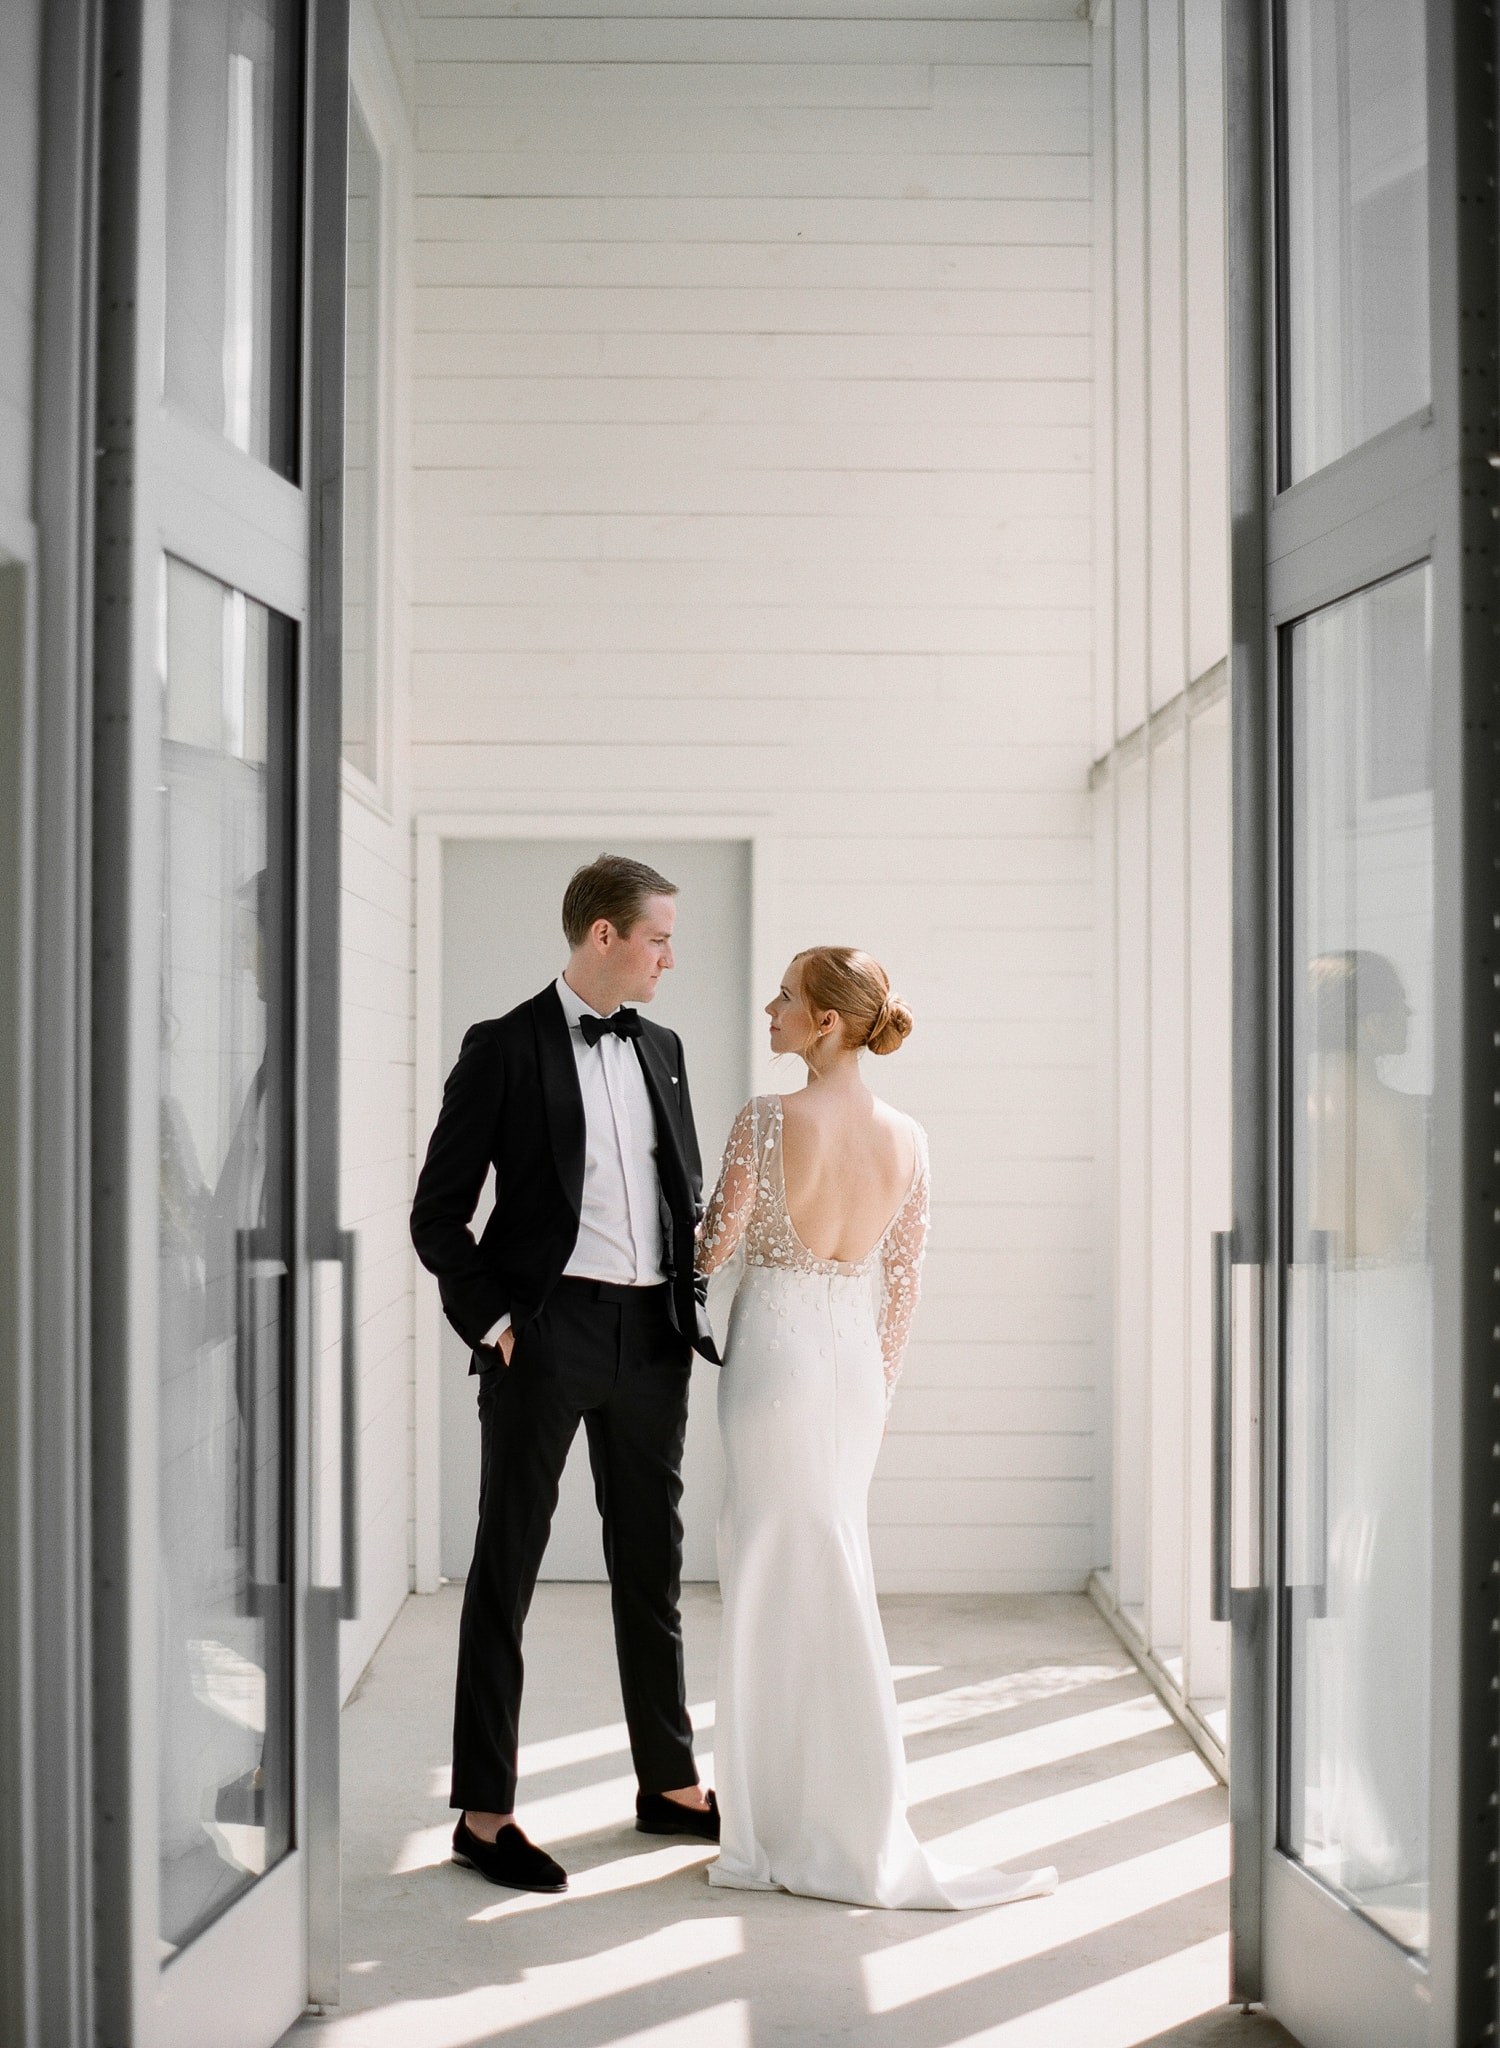 PROSPECT_HOUSE_WEDDING_AUSTIN_TX_MATTHEW_MOORE-00181.jpg